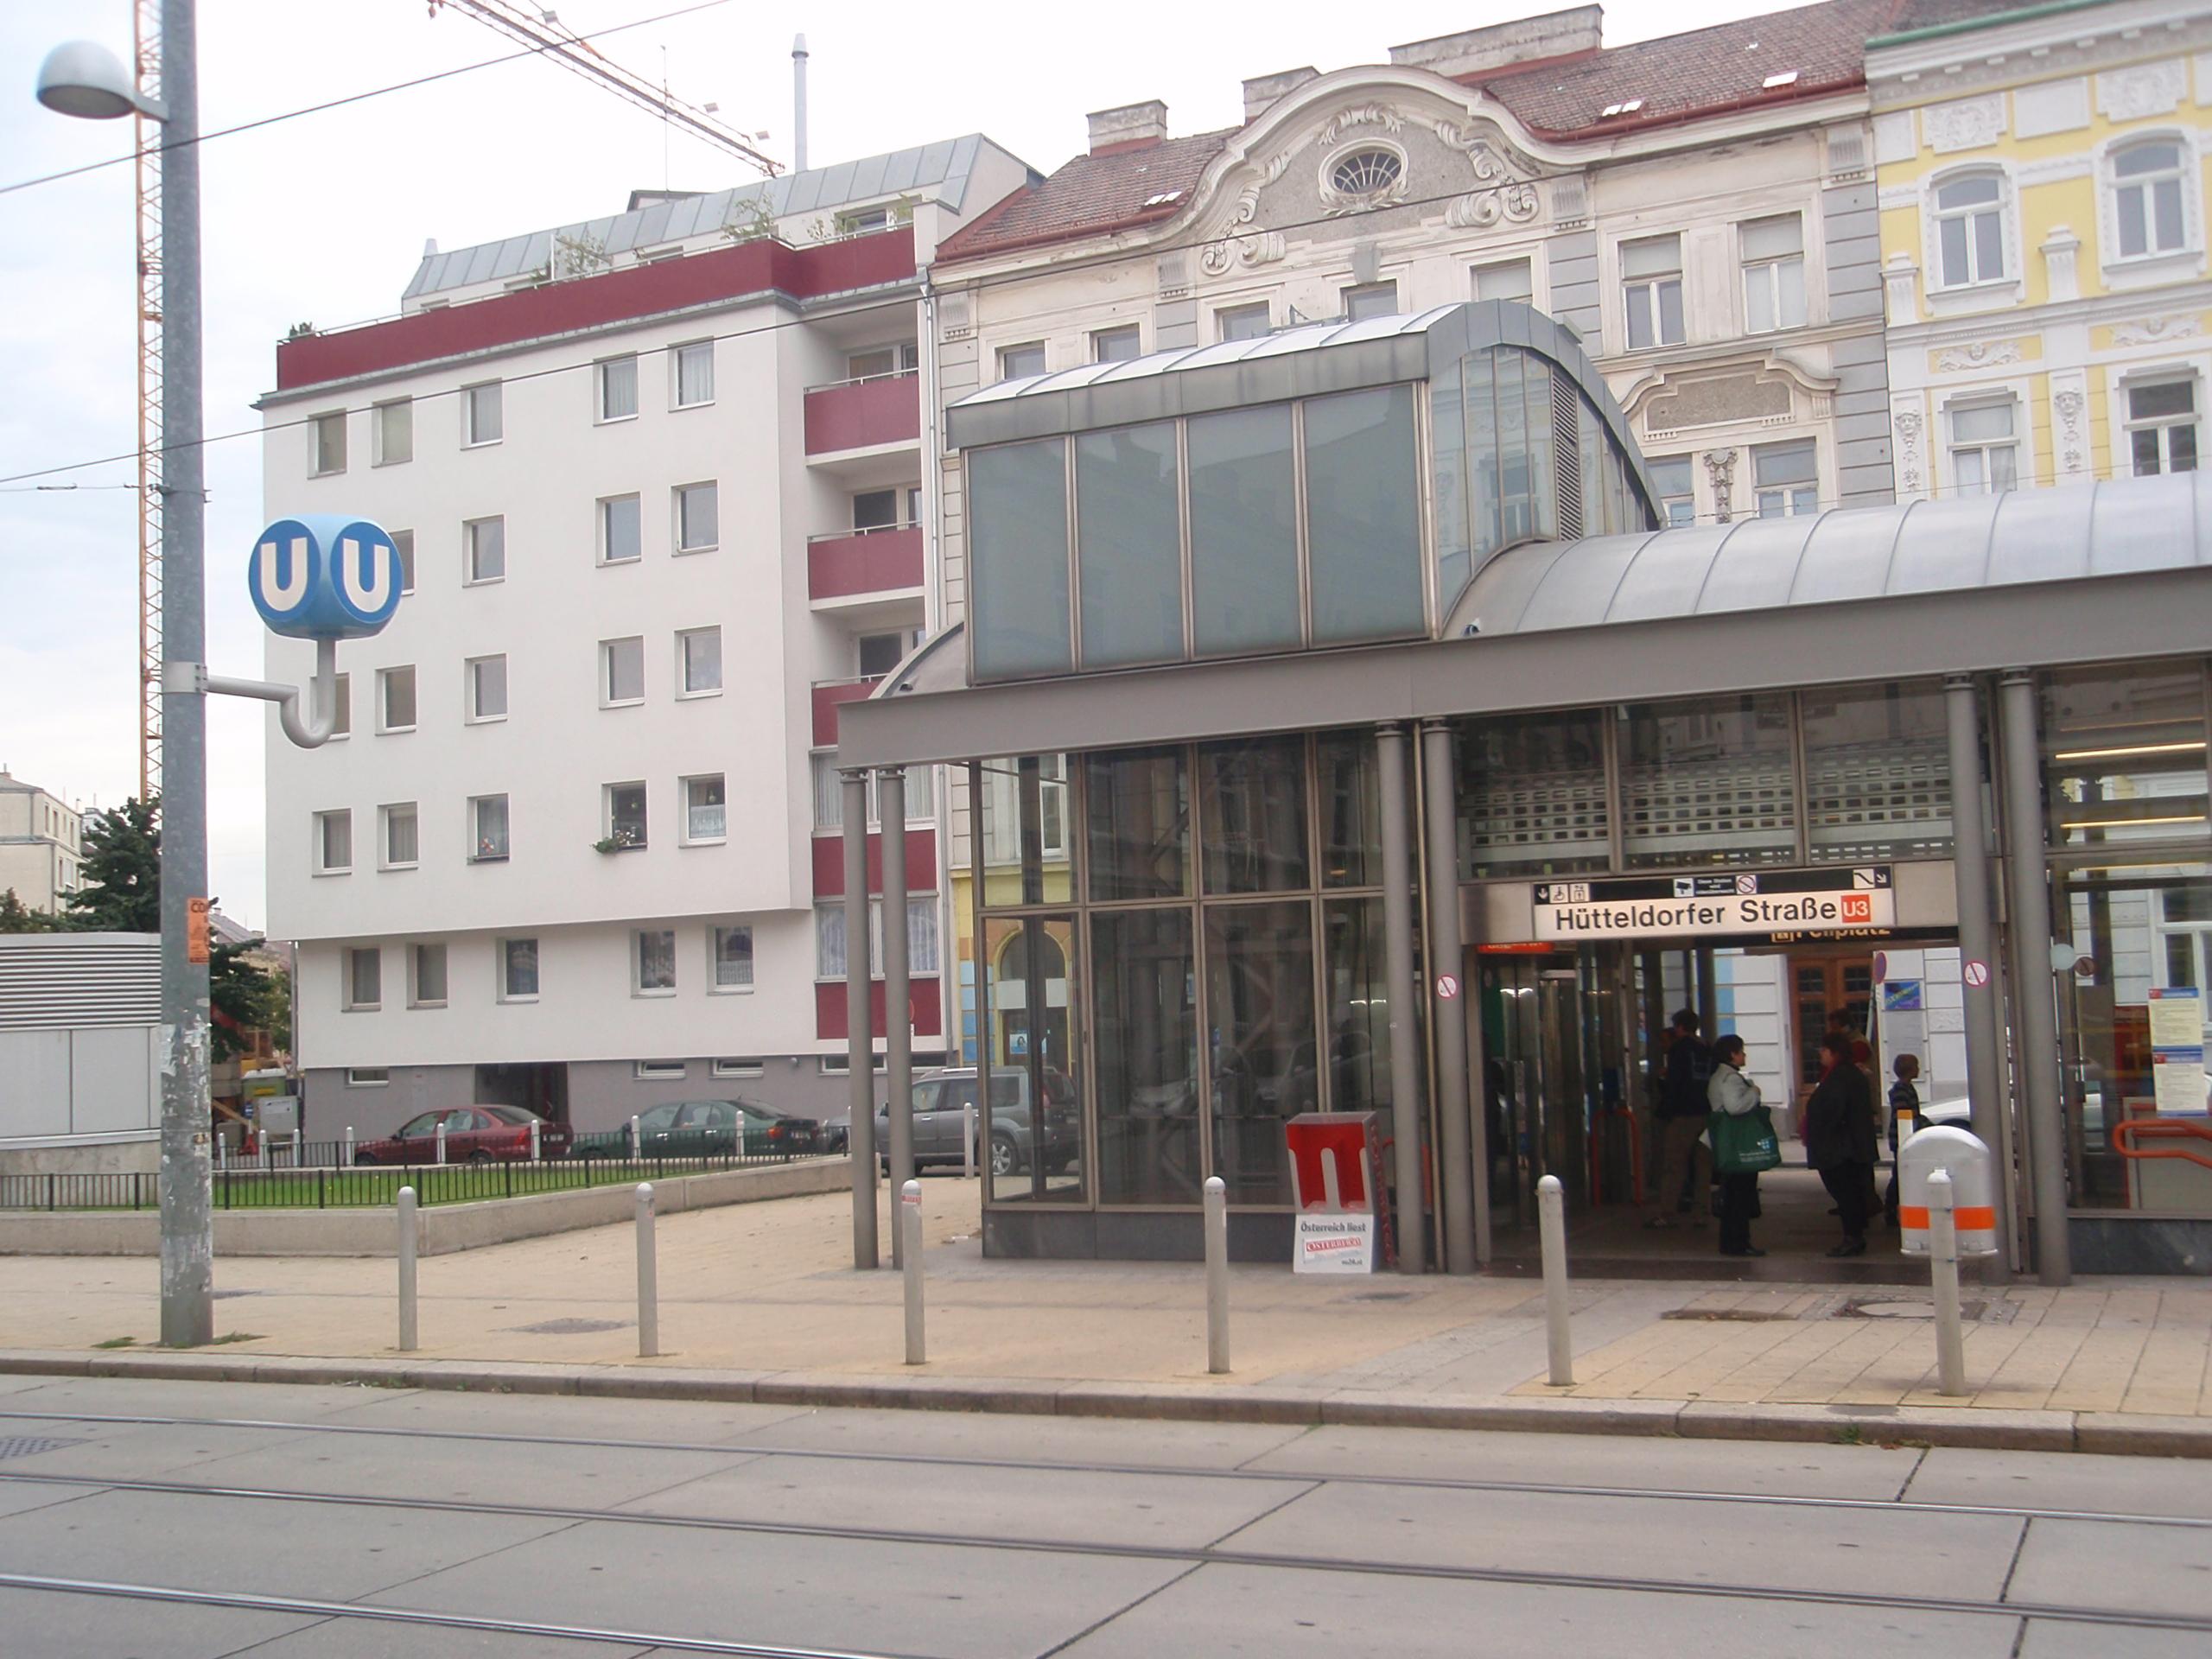 U Bahn Station Hütteldorfer Straße Wikipedia